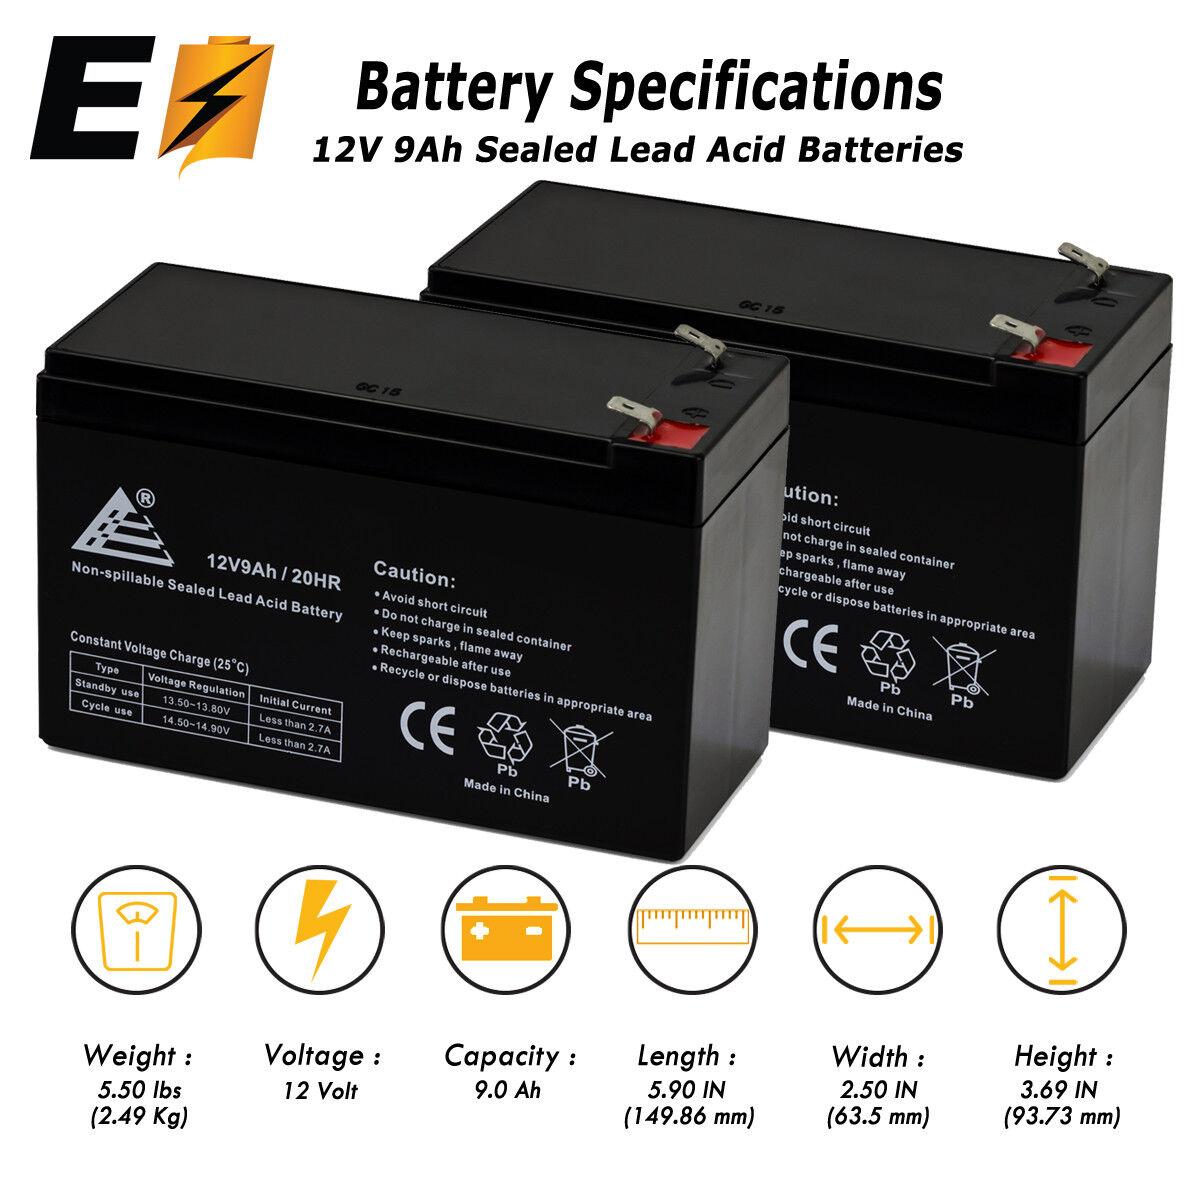 2 X 12V 9AH Battery for RAZOR Scooter E200 E300 ES300; Bella